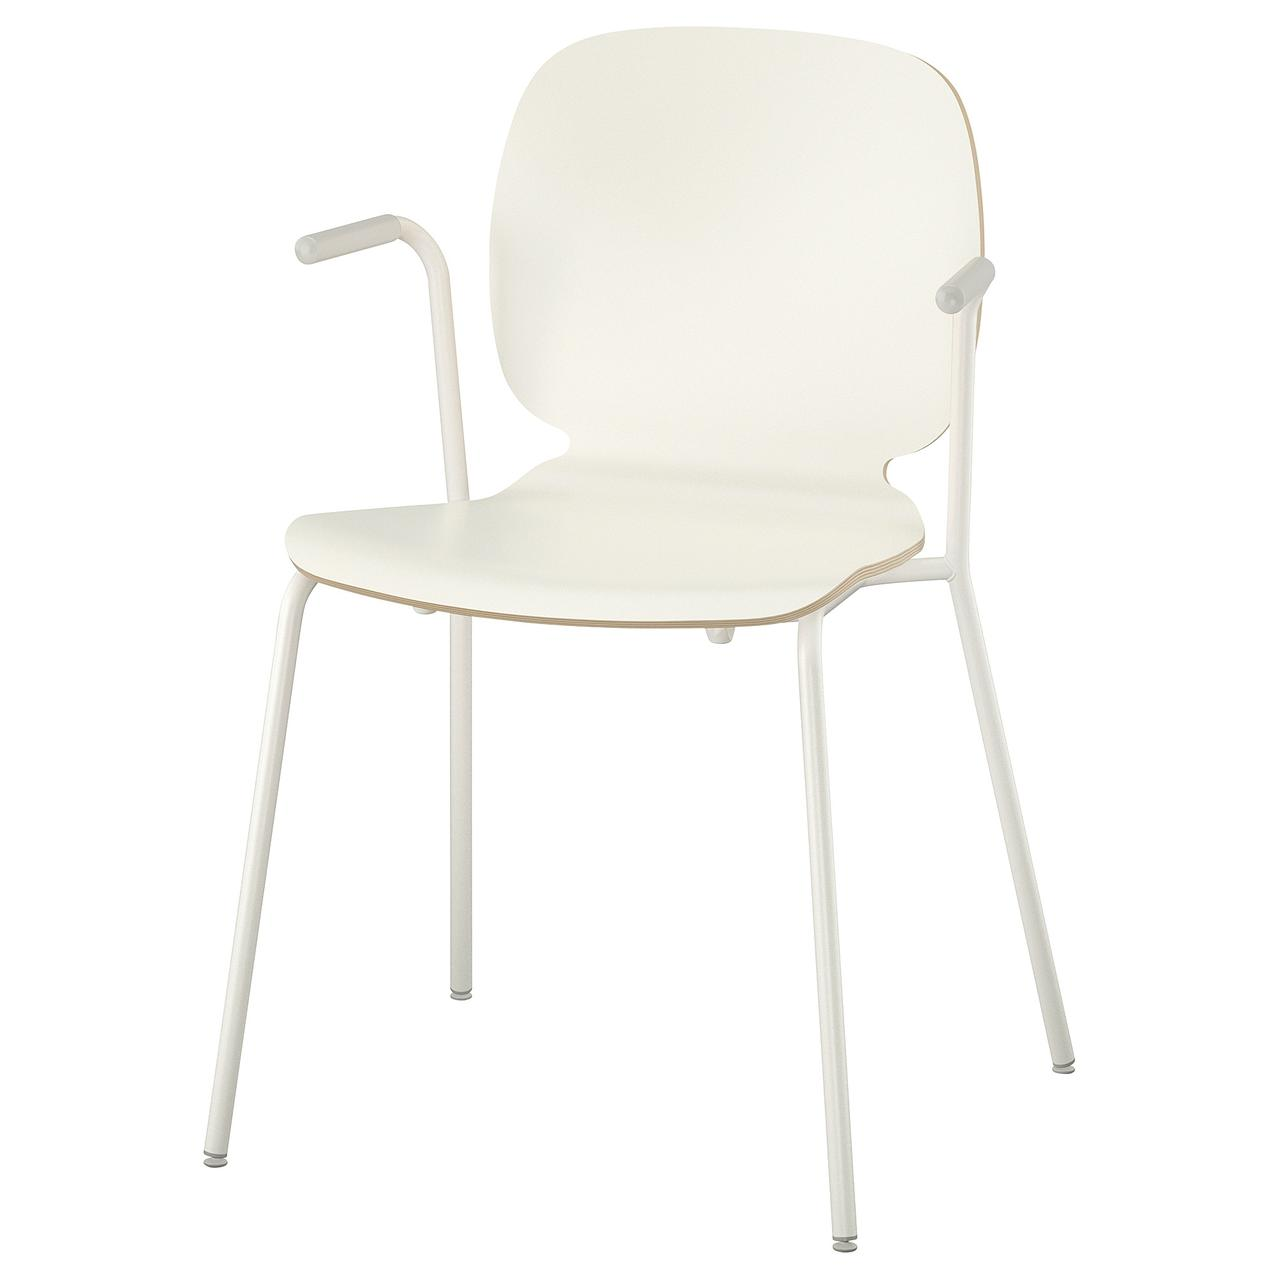 СВЕН-БЕРТИЛЬ Легкое кресло, белый, Дитмар белый